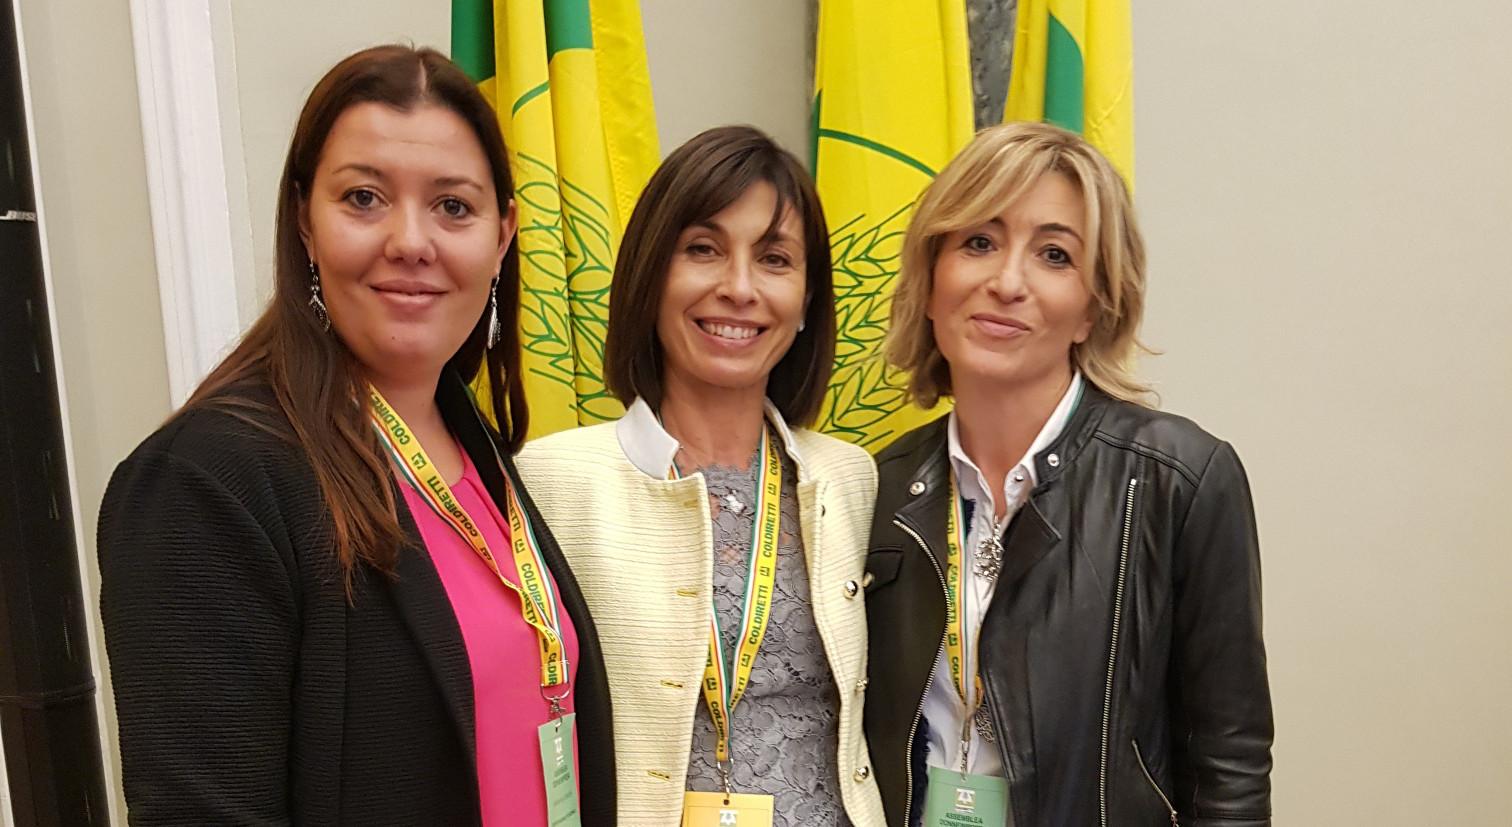 Chiara Bortolas Coldiretti